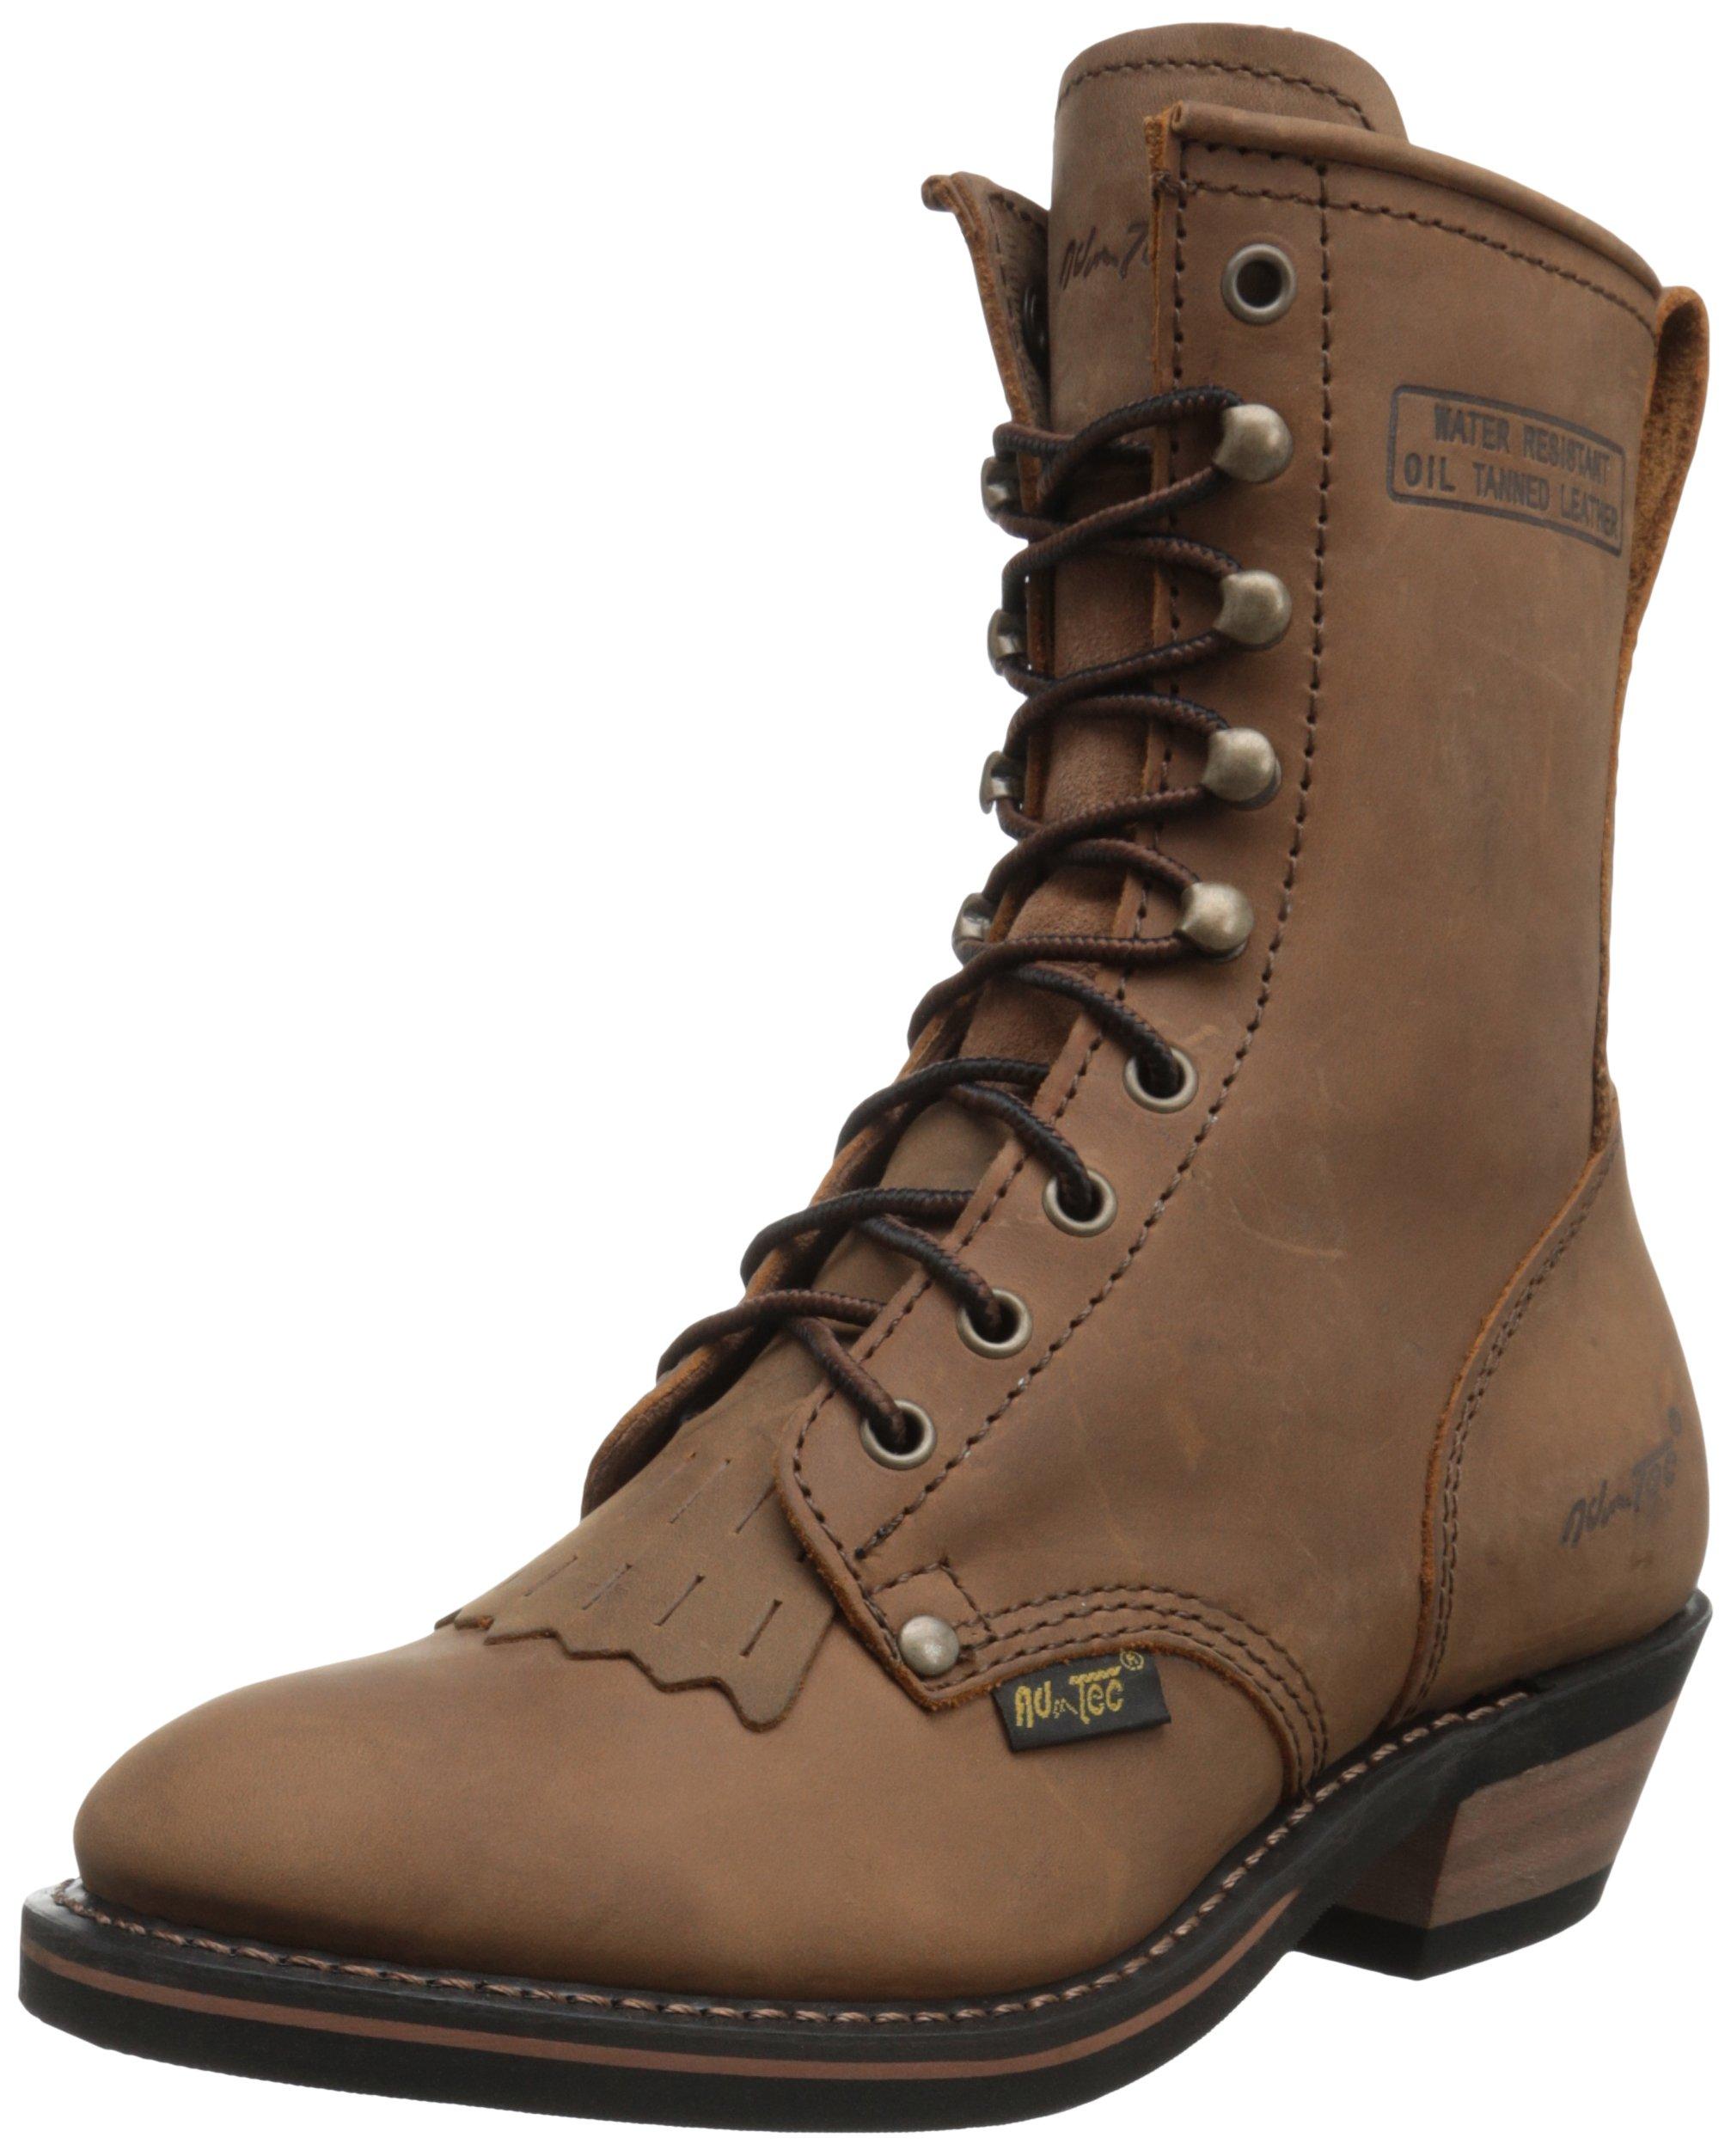 Adtec Women's 8 inch Packer TN Work Boot, Tan, 7.5 M US